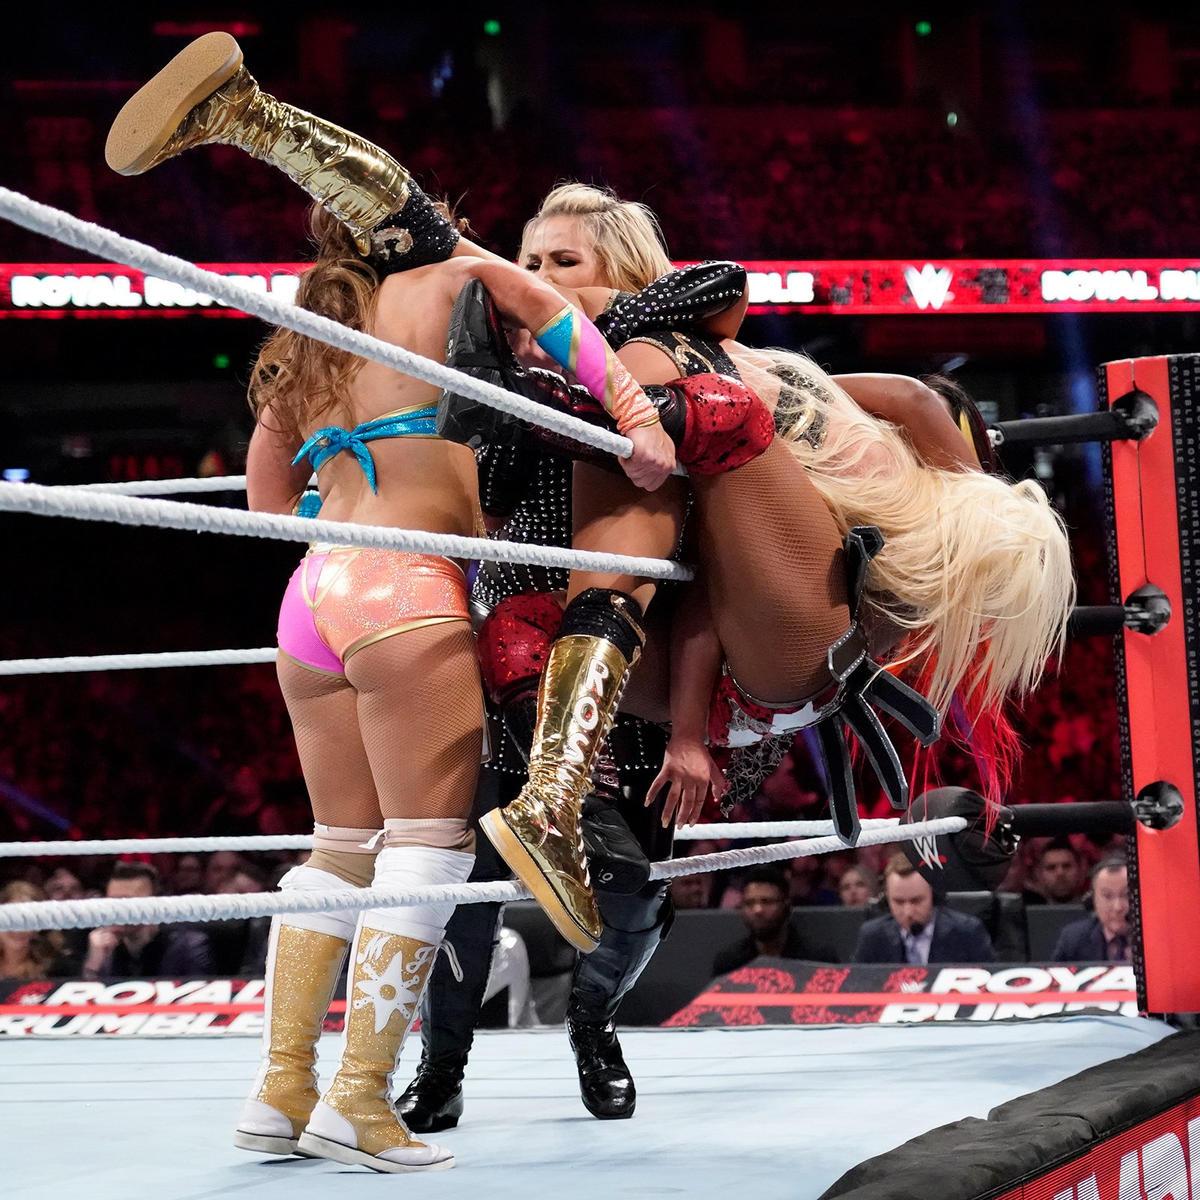 2019 Women's Royal Rumble Match: photos 1/58 Presented by WWE Photo 1/58 Presented by WWE Photo Related Galleries  212_RR_01272019cm_2740--91ceeae5ae54f0bb151922f829c9f977